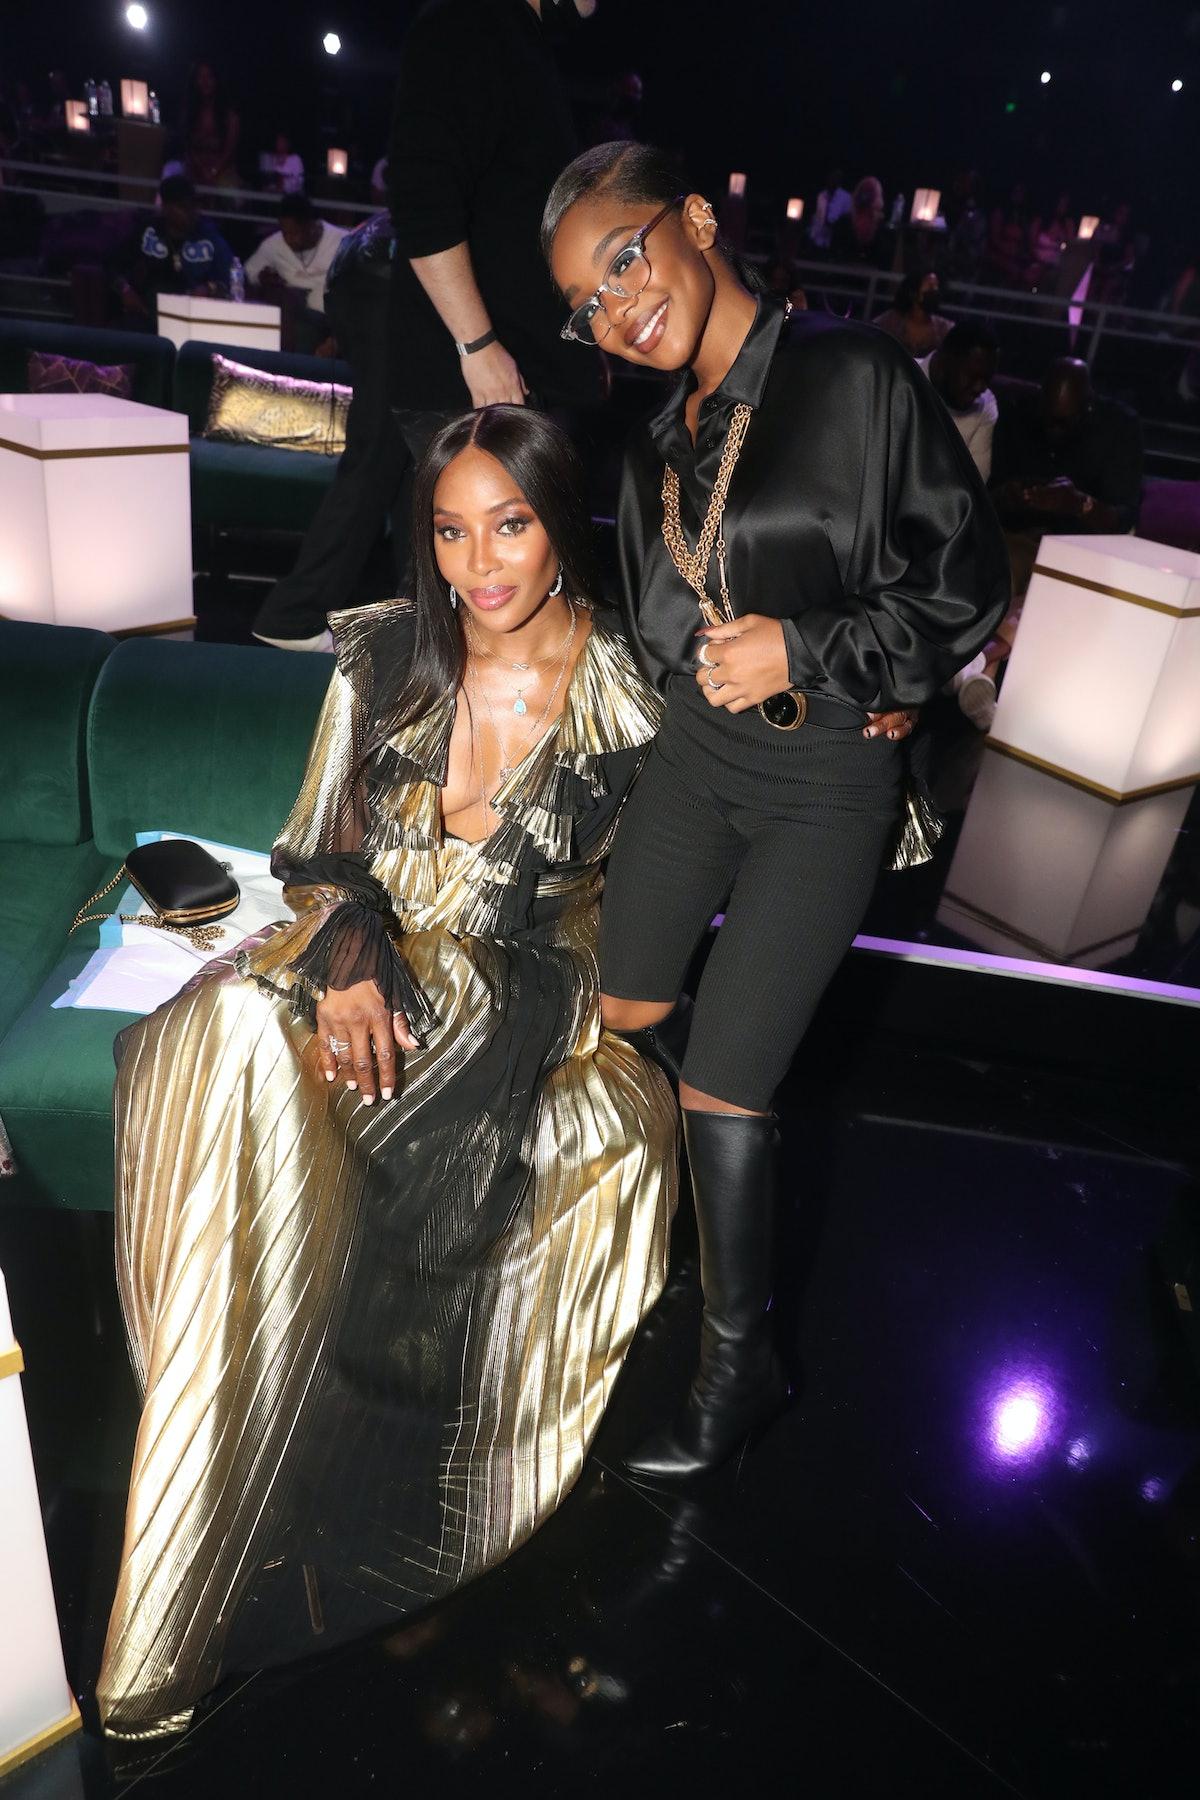 Naomi Campbell and Marsai Martin at the 2021 BET Awards